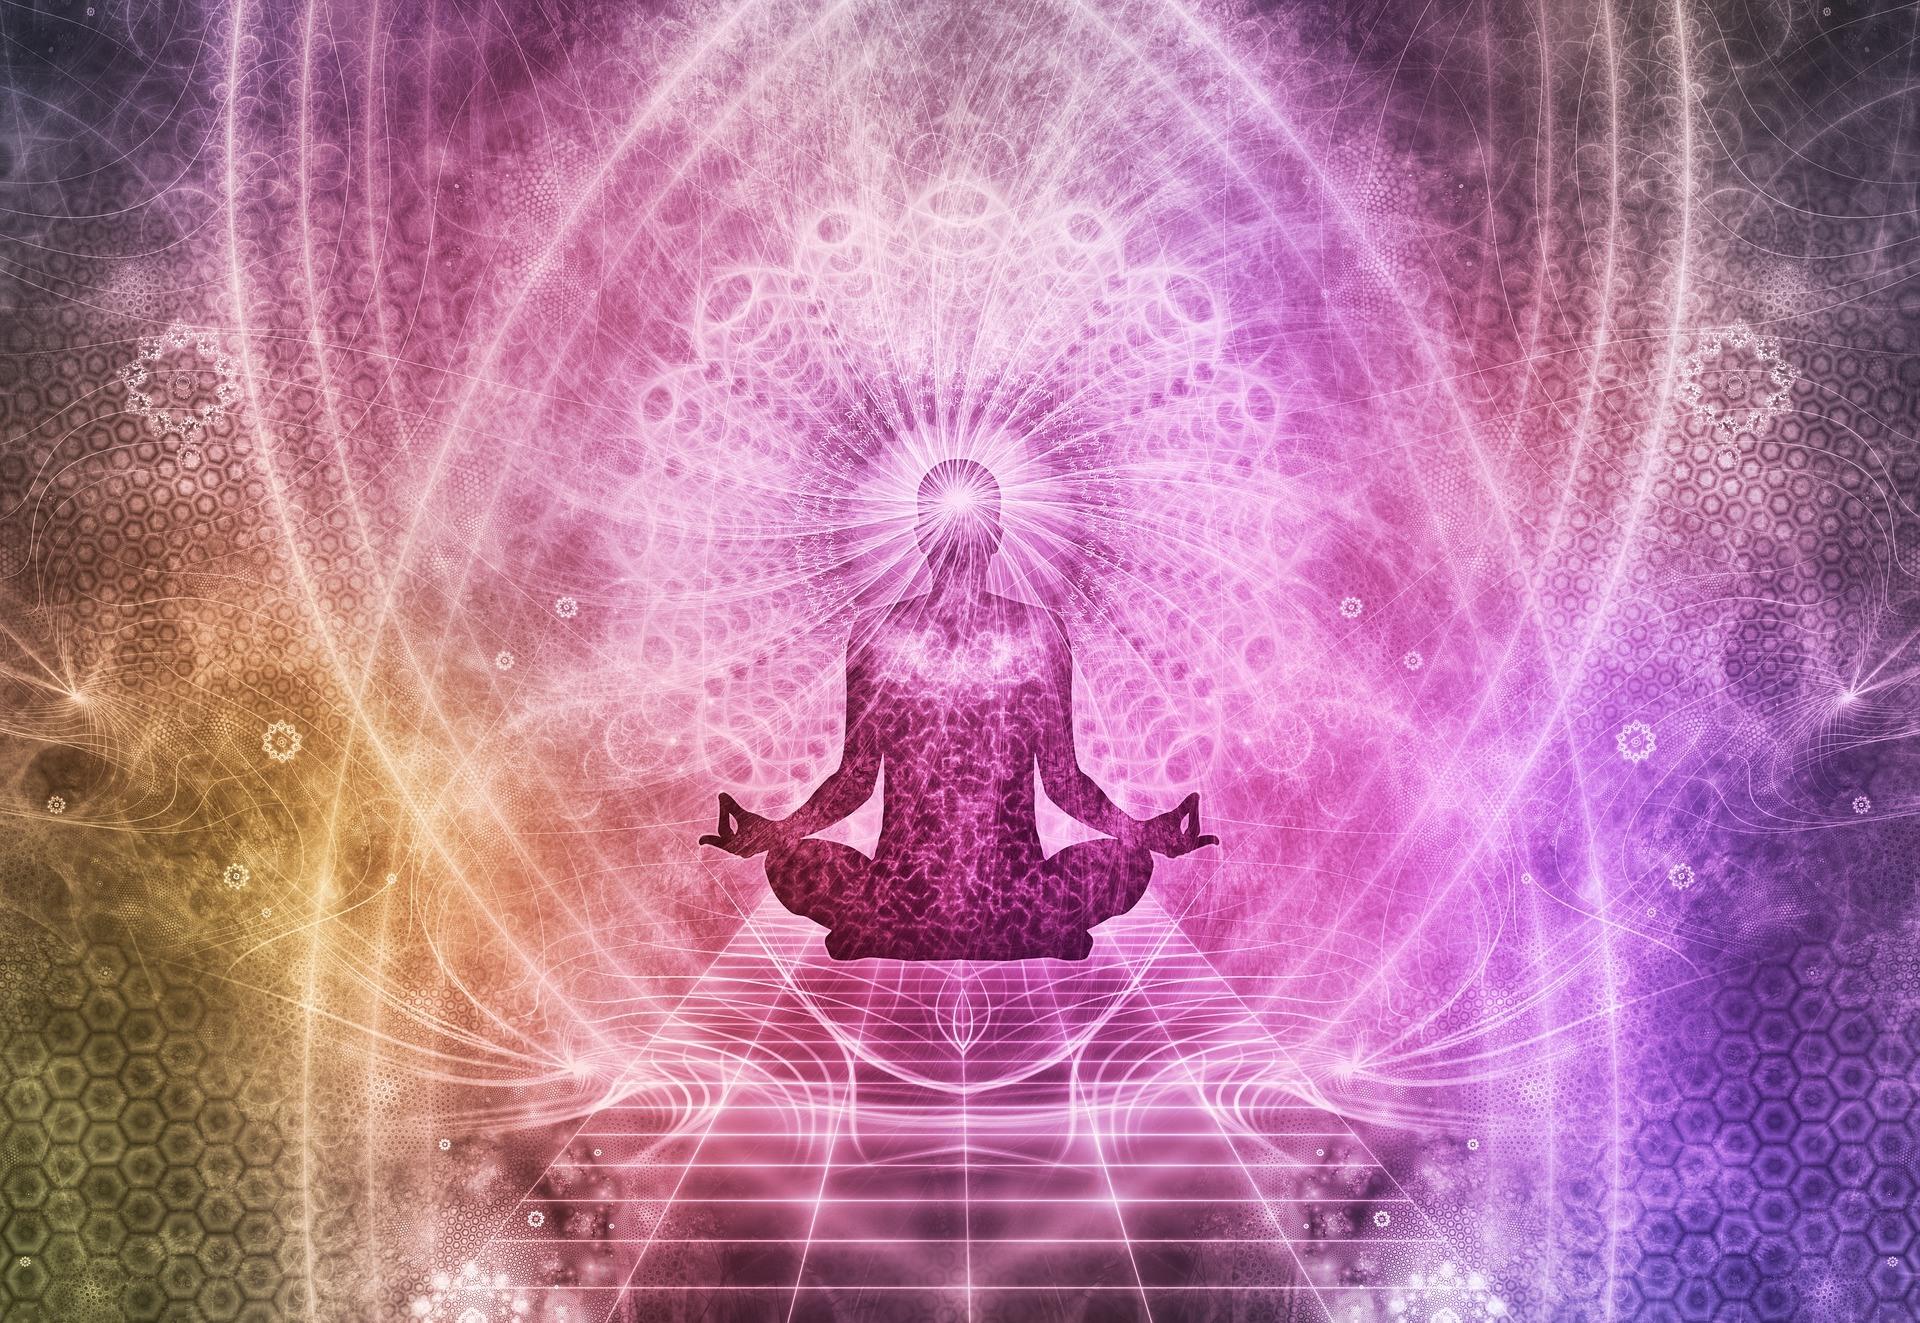 Kundalini Yoga Dangers - Man meditating and having kundalini awakening experience